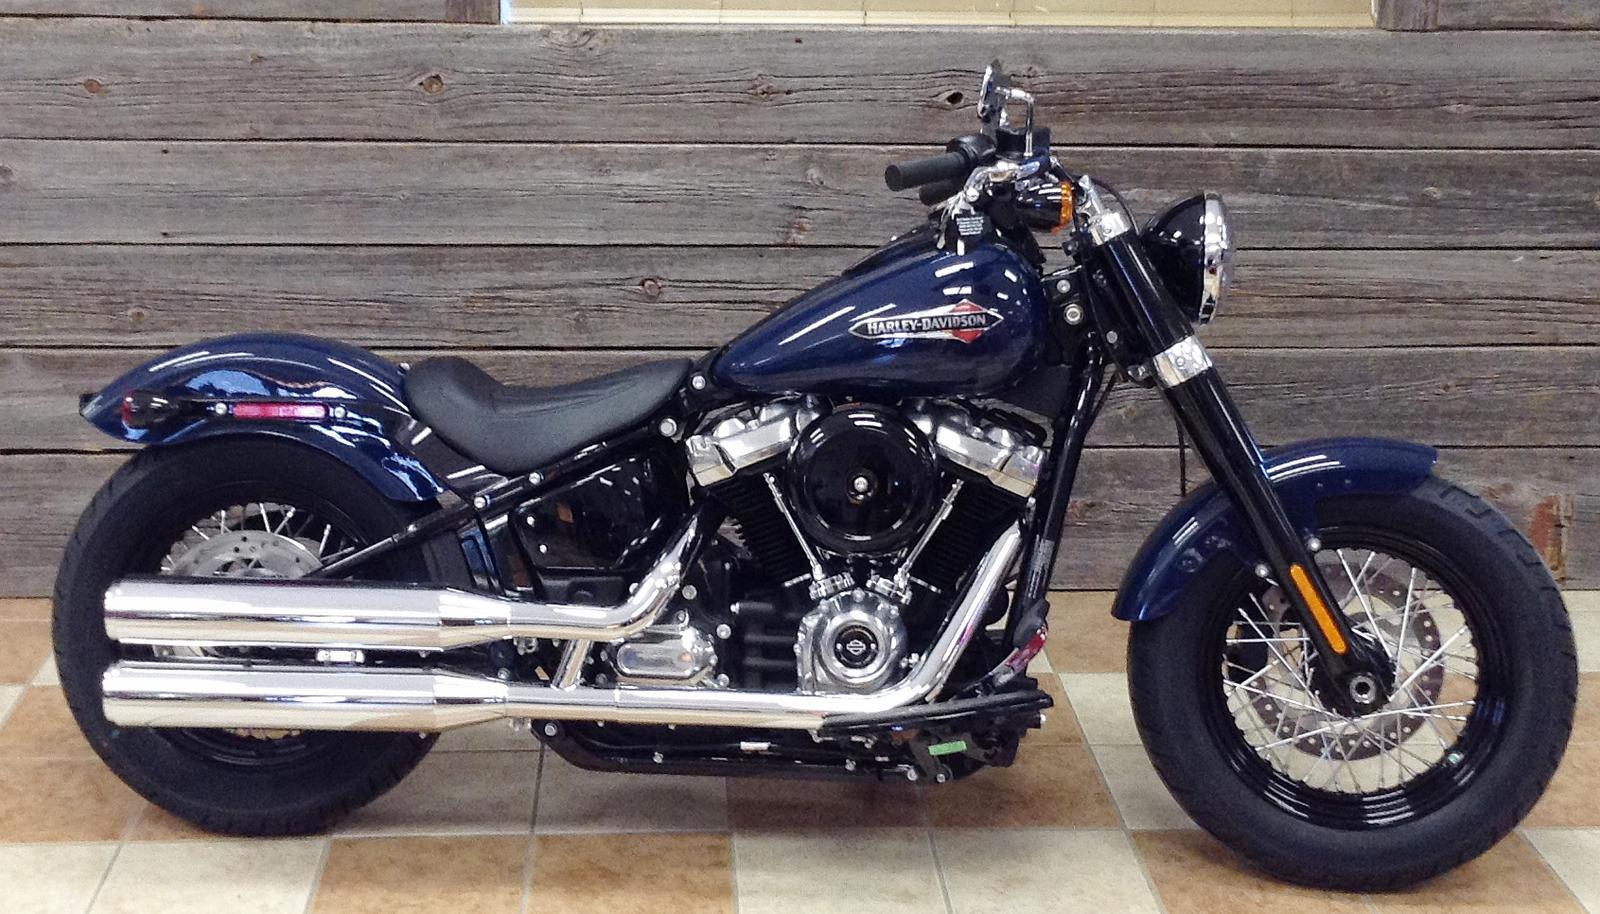 2019 Harley-Davidson® Softail Slim® - Color Option for sale in